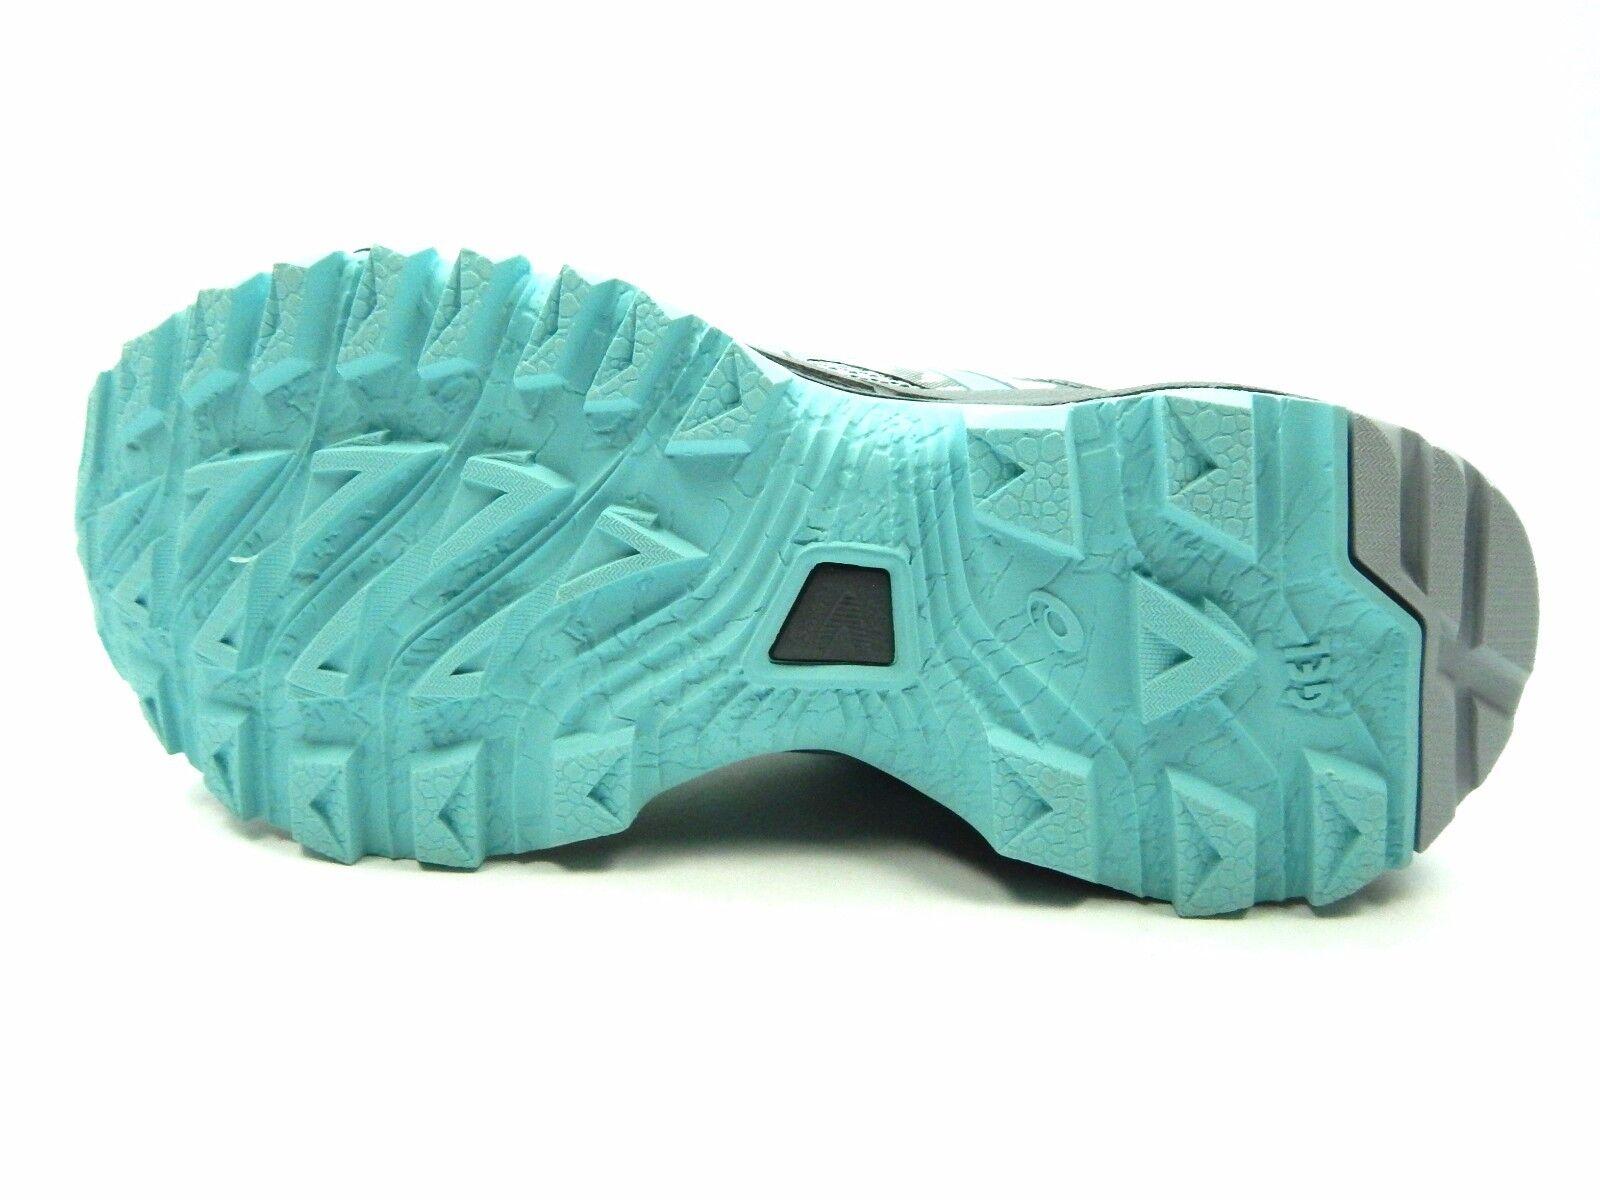 ASICS GEL SONOMA 3 GREY (D) T776N 9667 MID GREY 3 AQUA CARBON WOMEN Schuhe SIZE 5, 5.5 & 19c67d